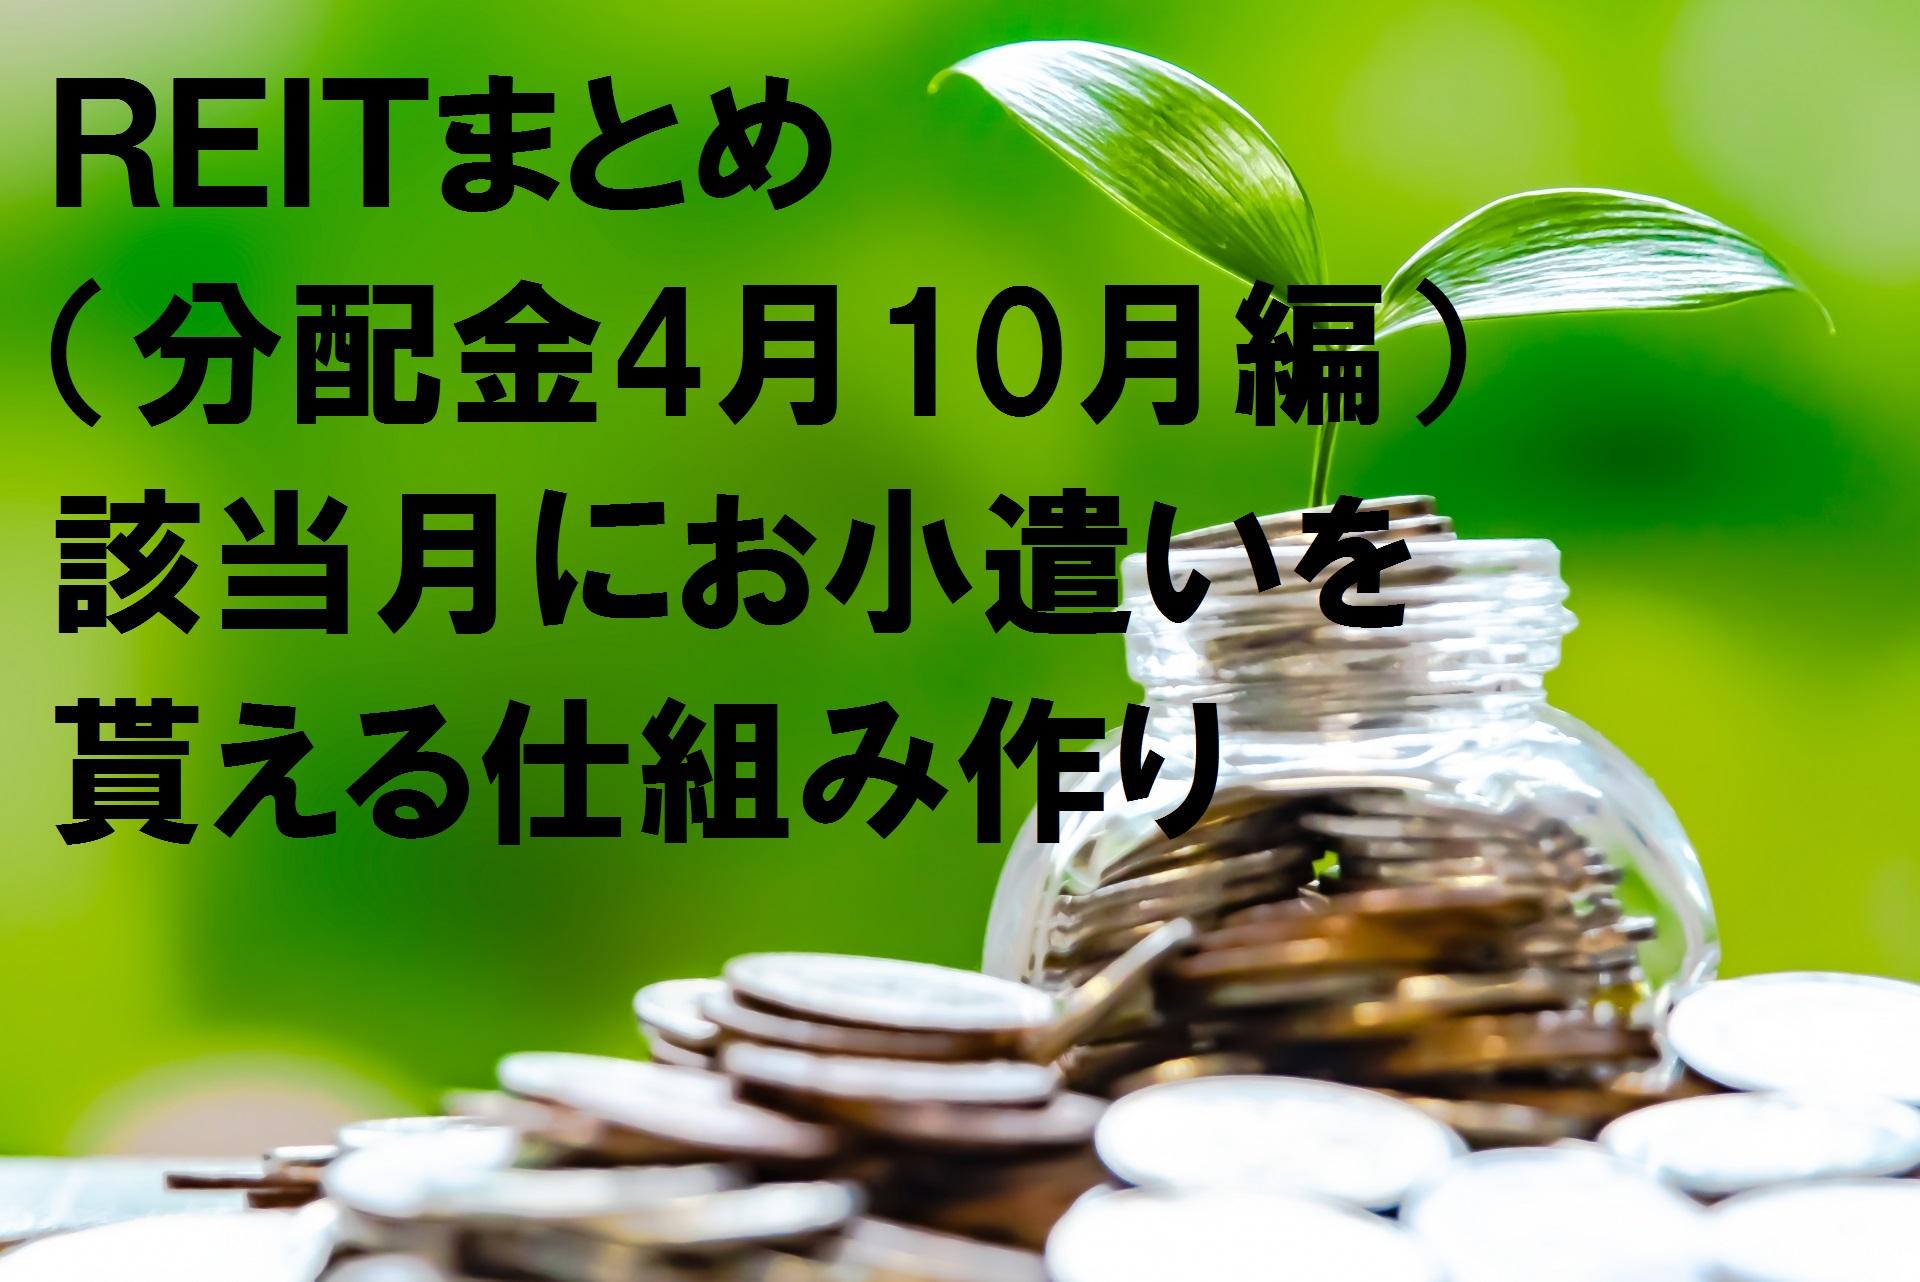 REITまとめ(分配金4月10月編)該当月にお小遣いを貰える仕組み作り